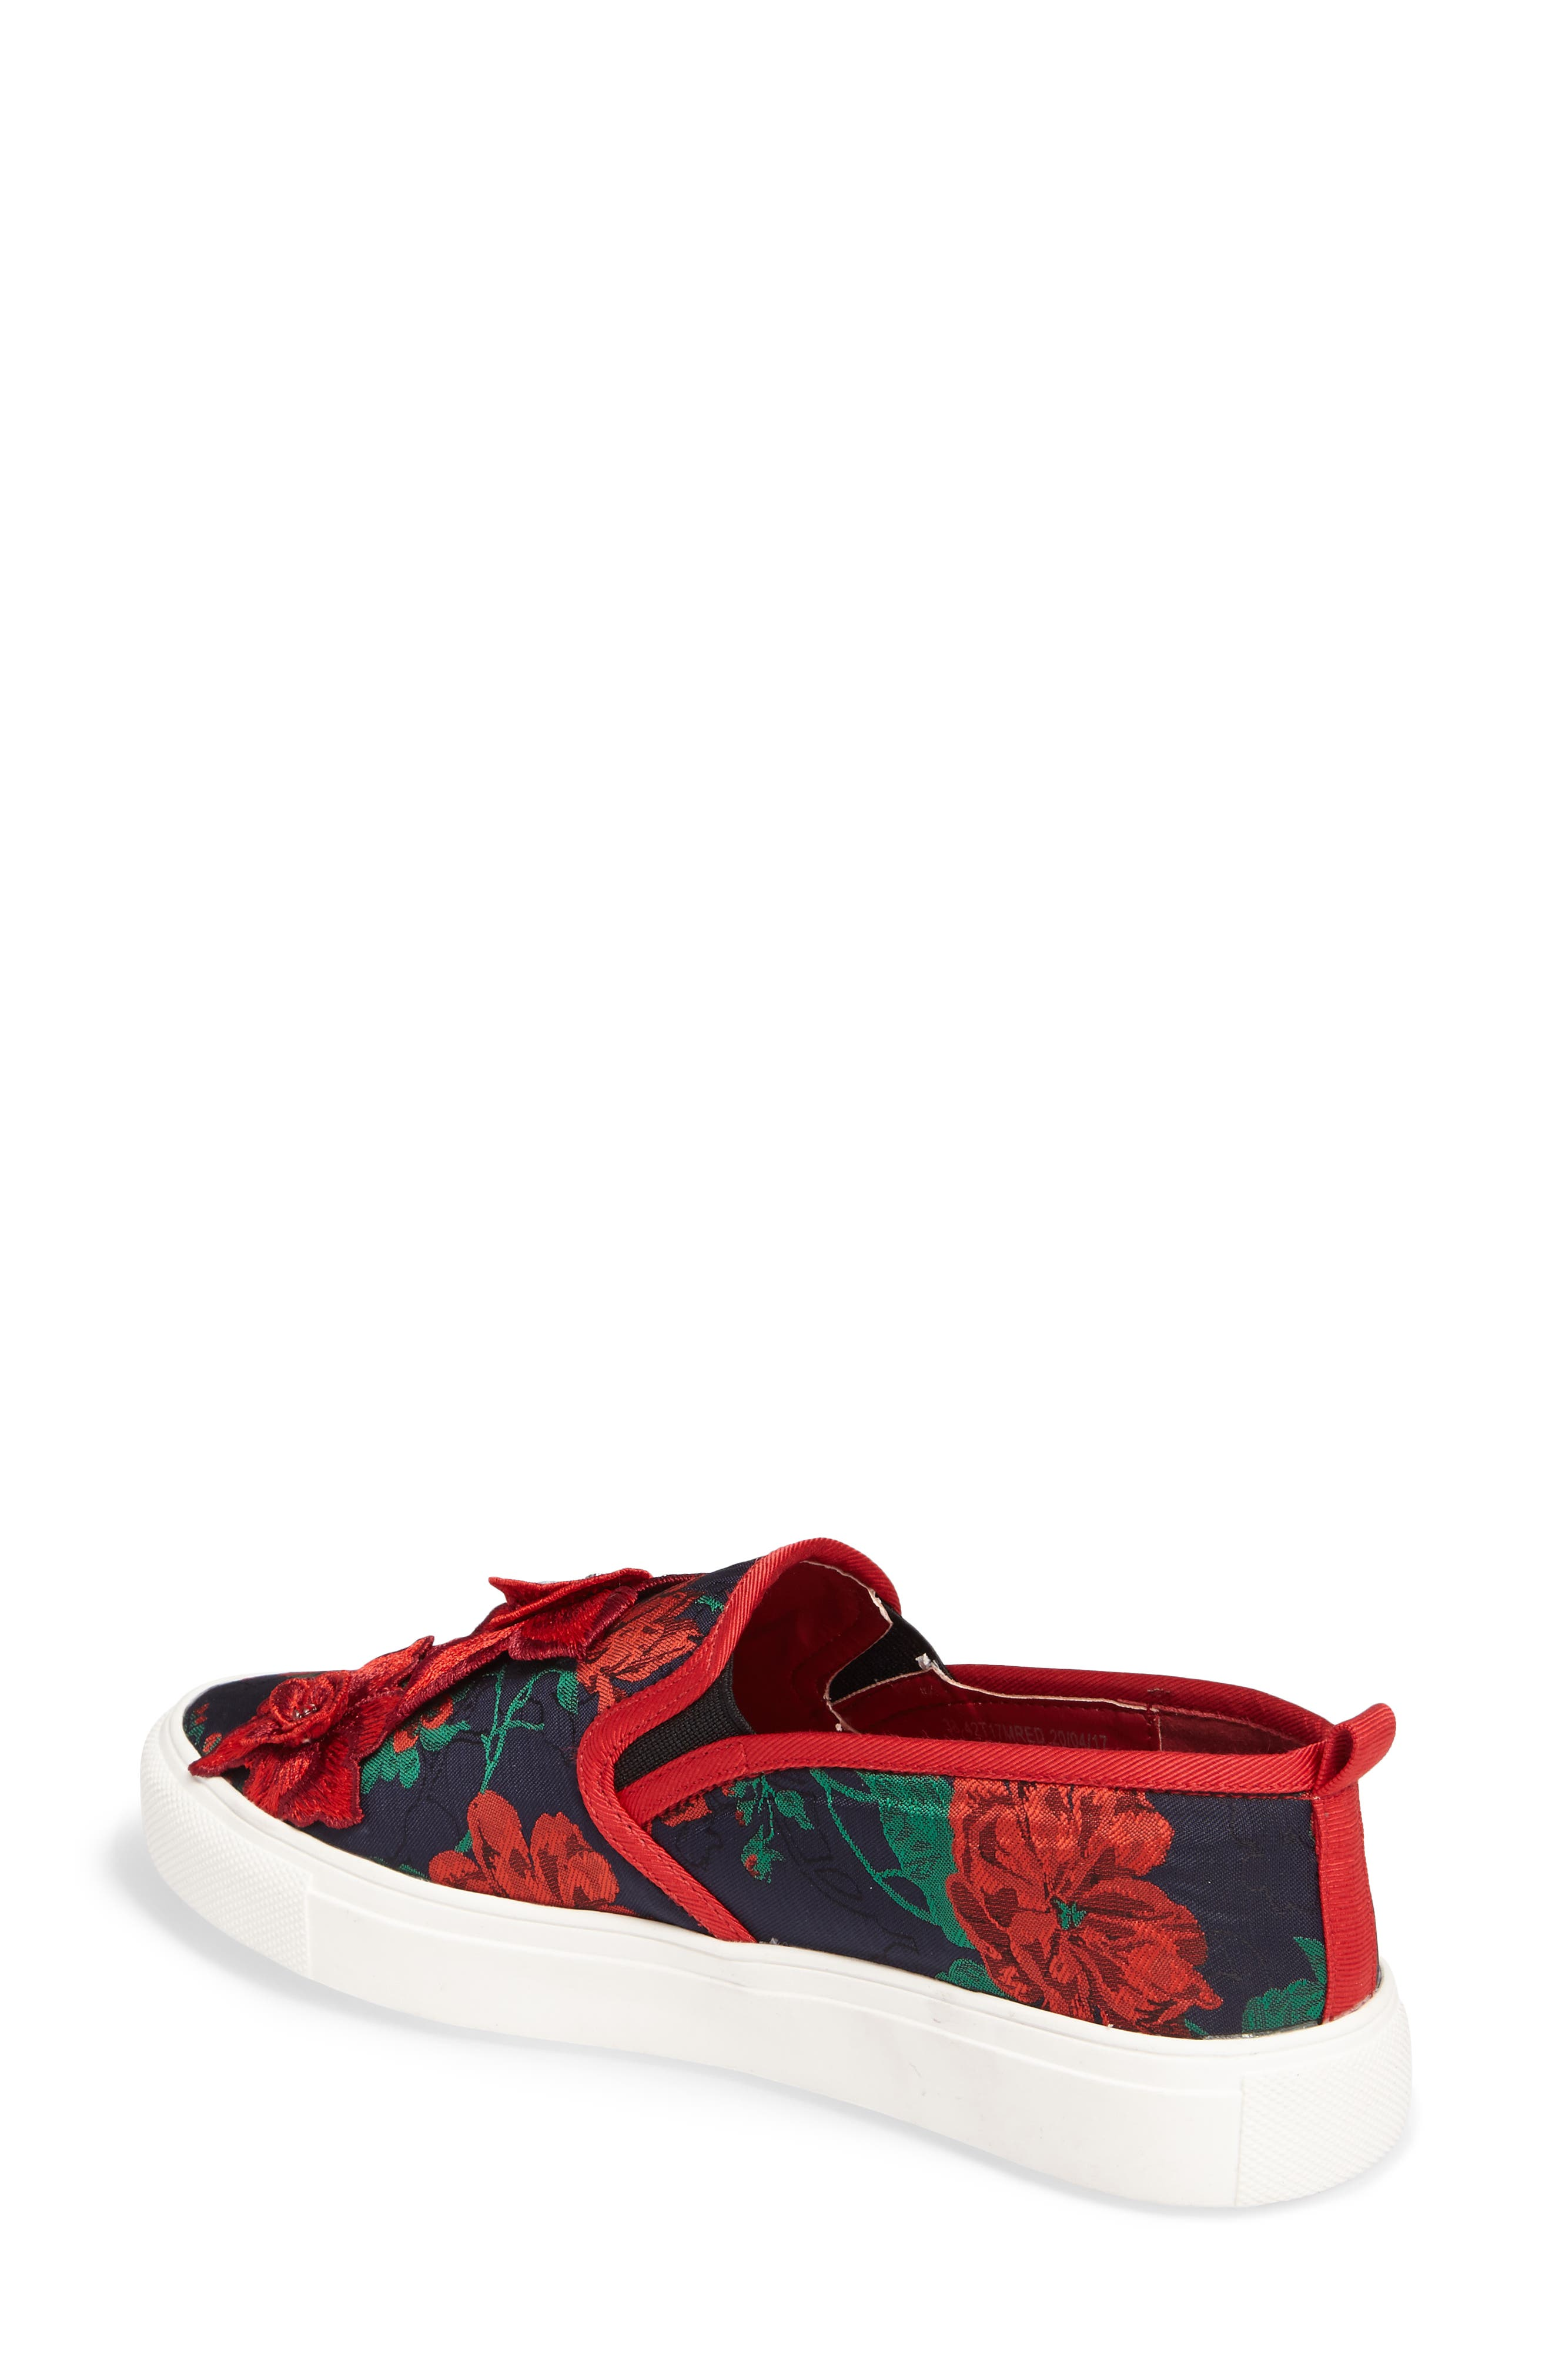 Alternate Image 2  - Topshop Tessa Embroidered Slip-On Sneaker (Women)